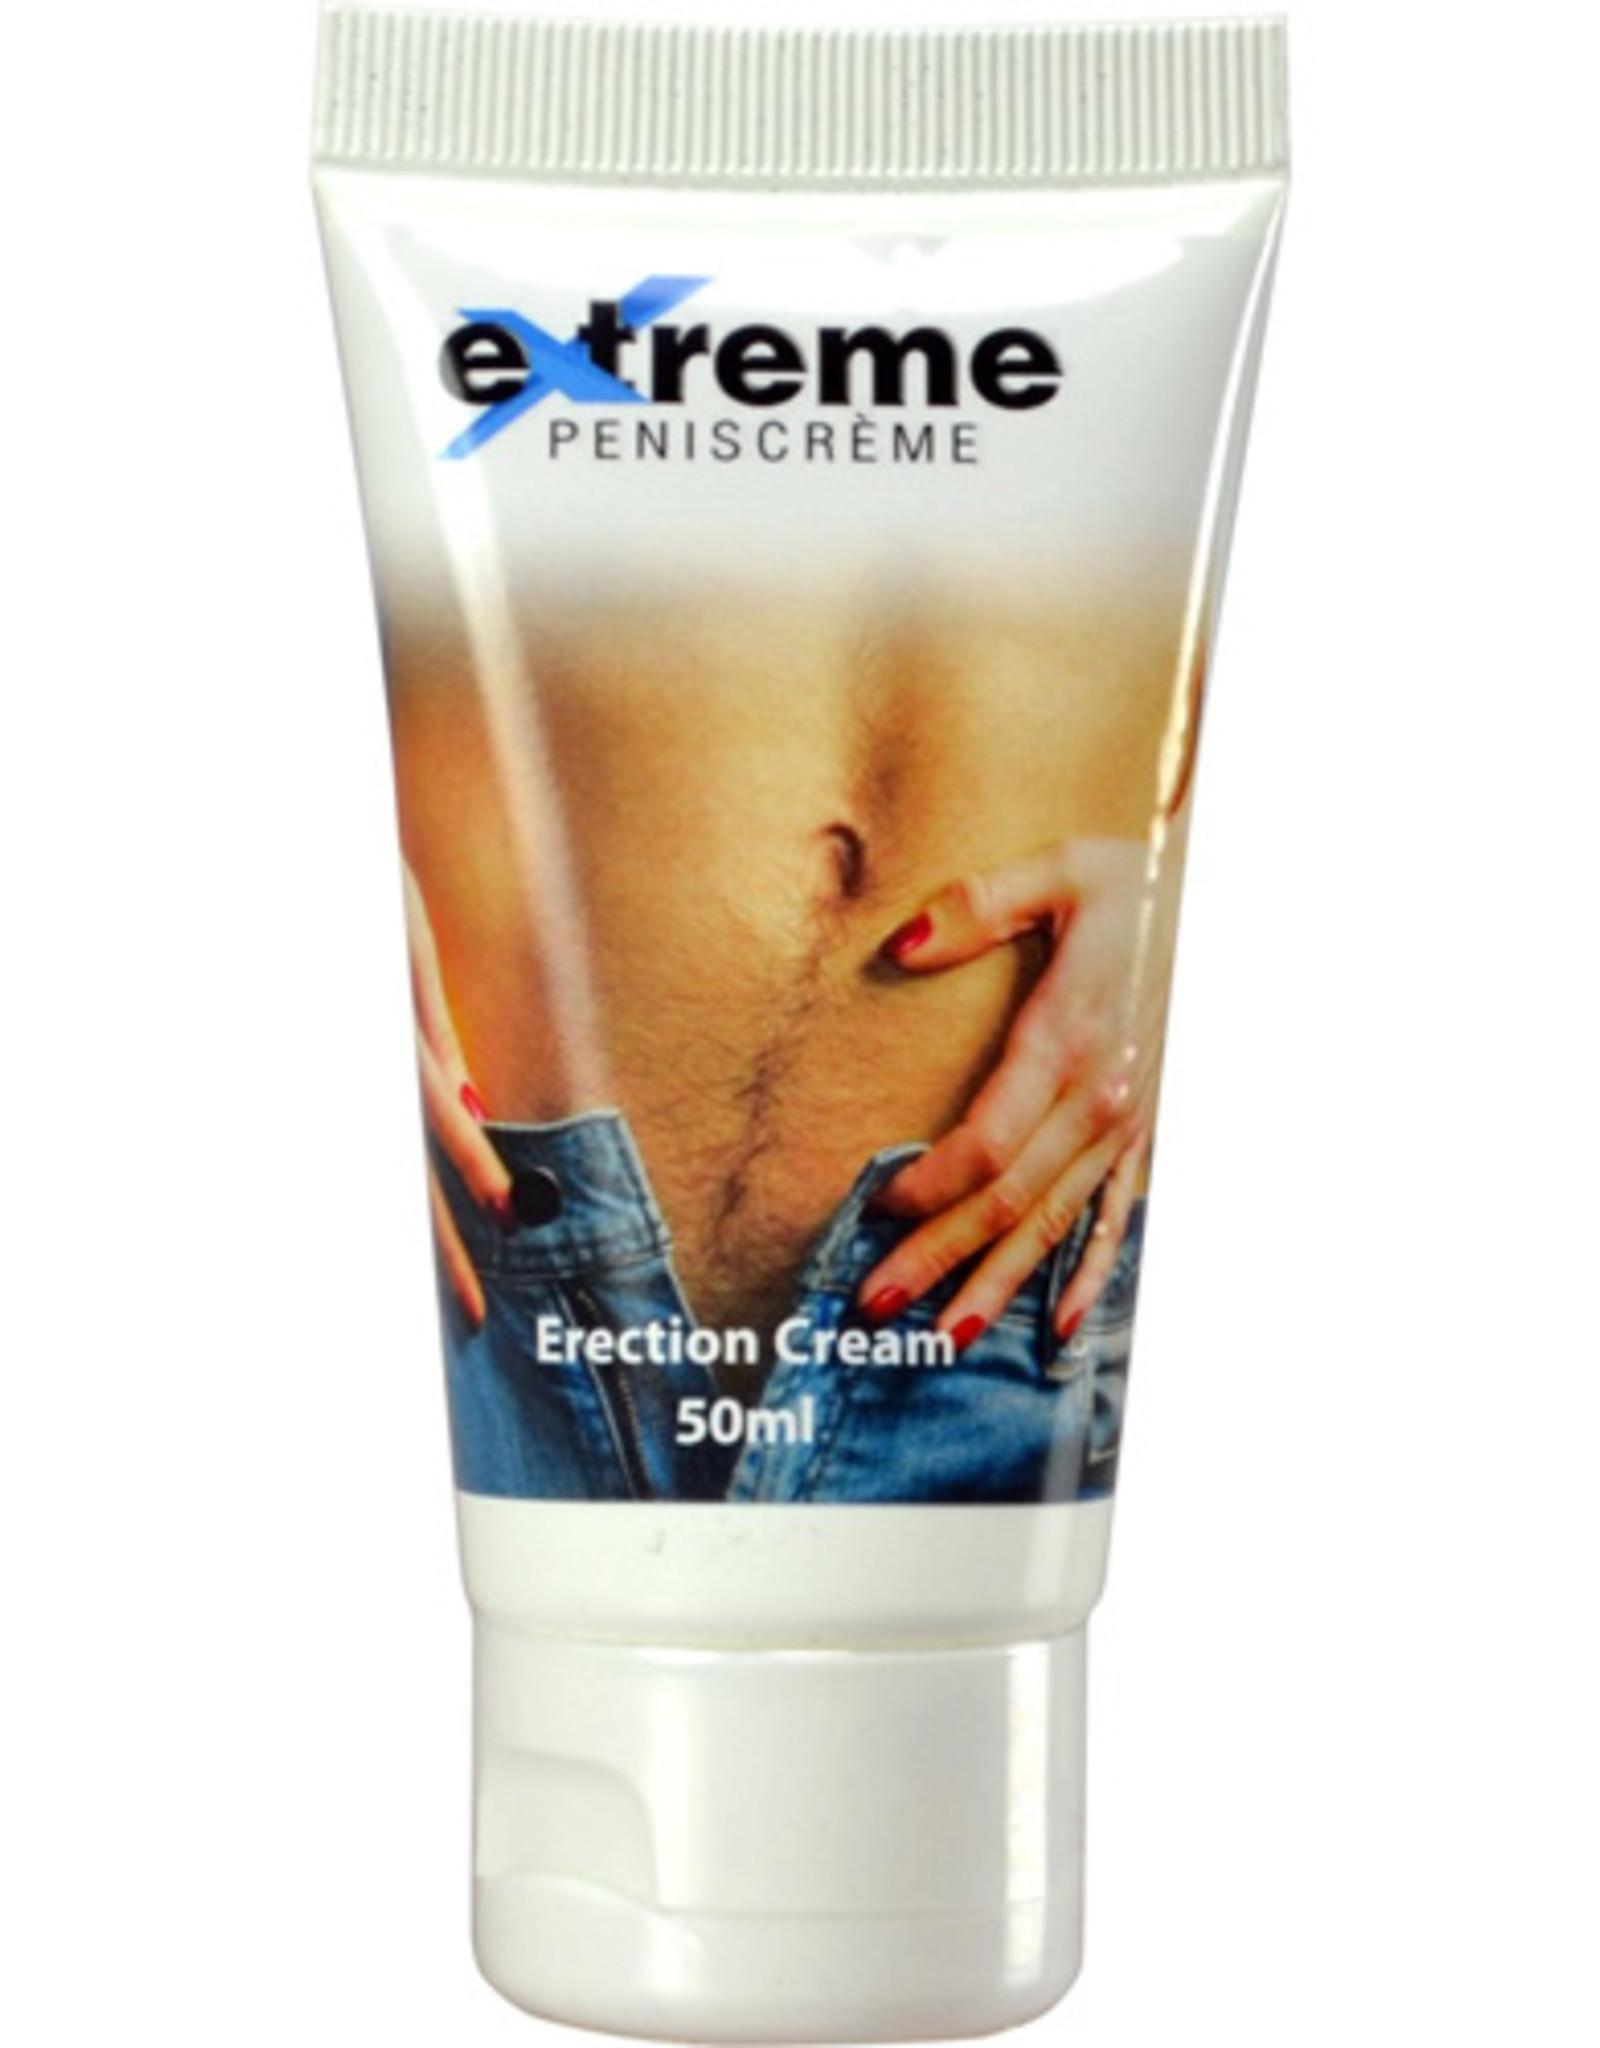 Morningstar Extreme Peniscrème